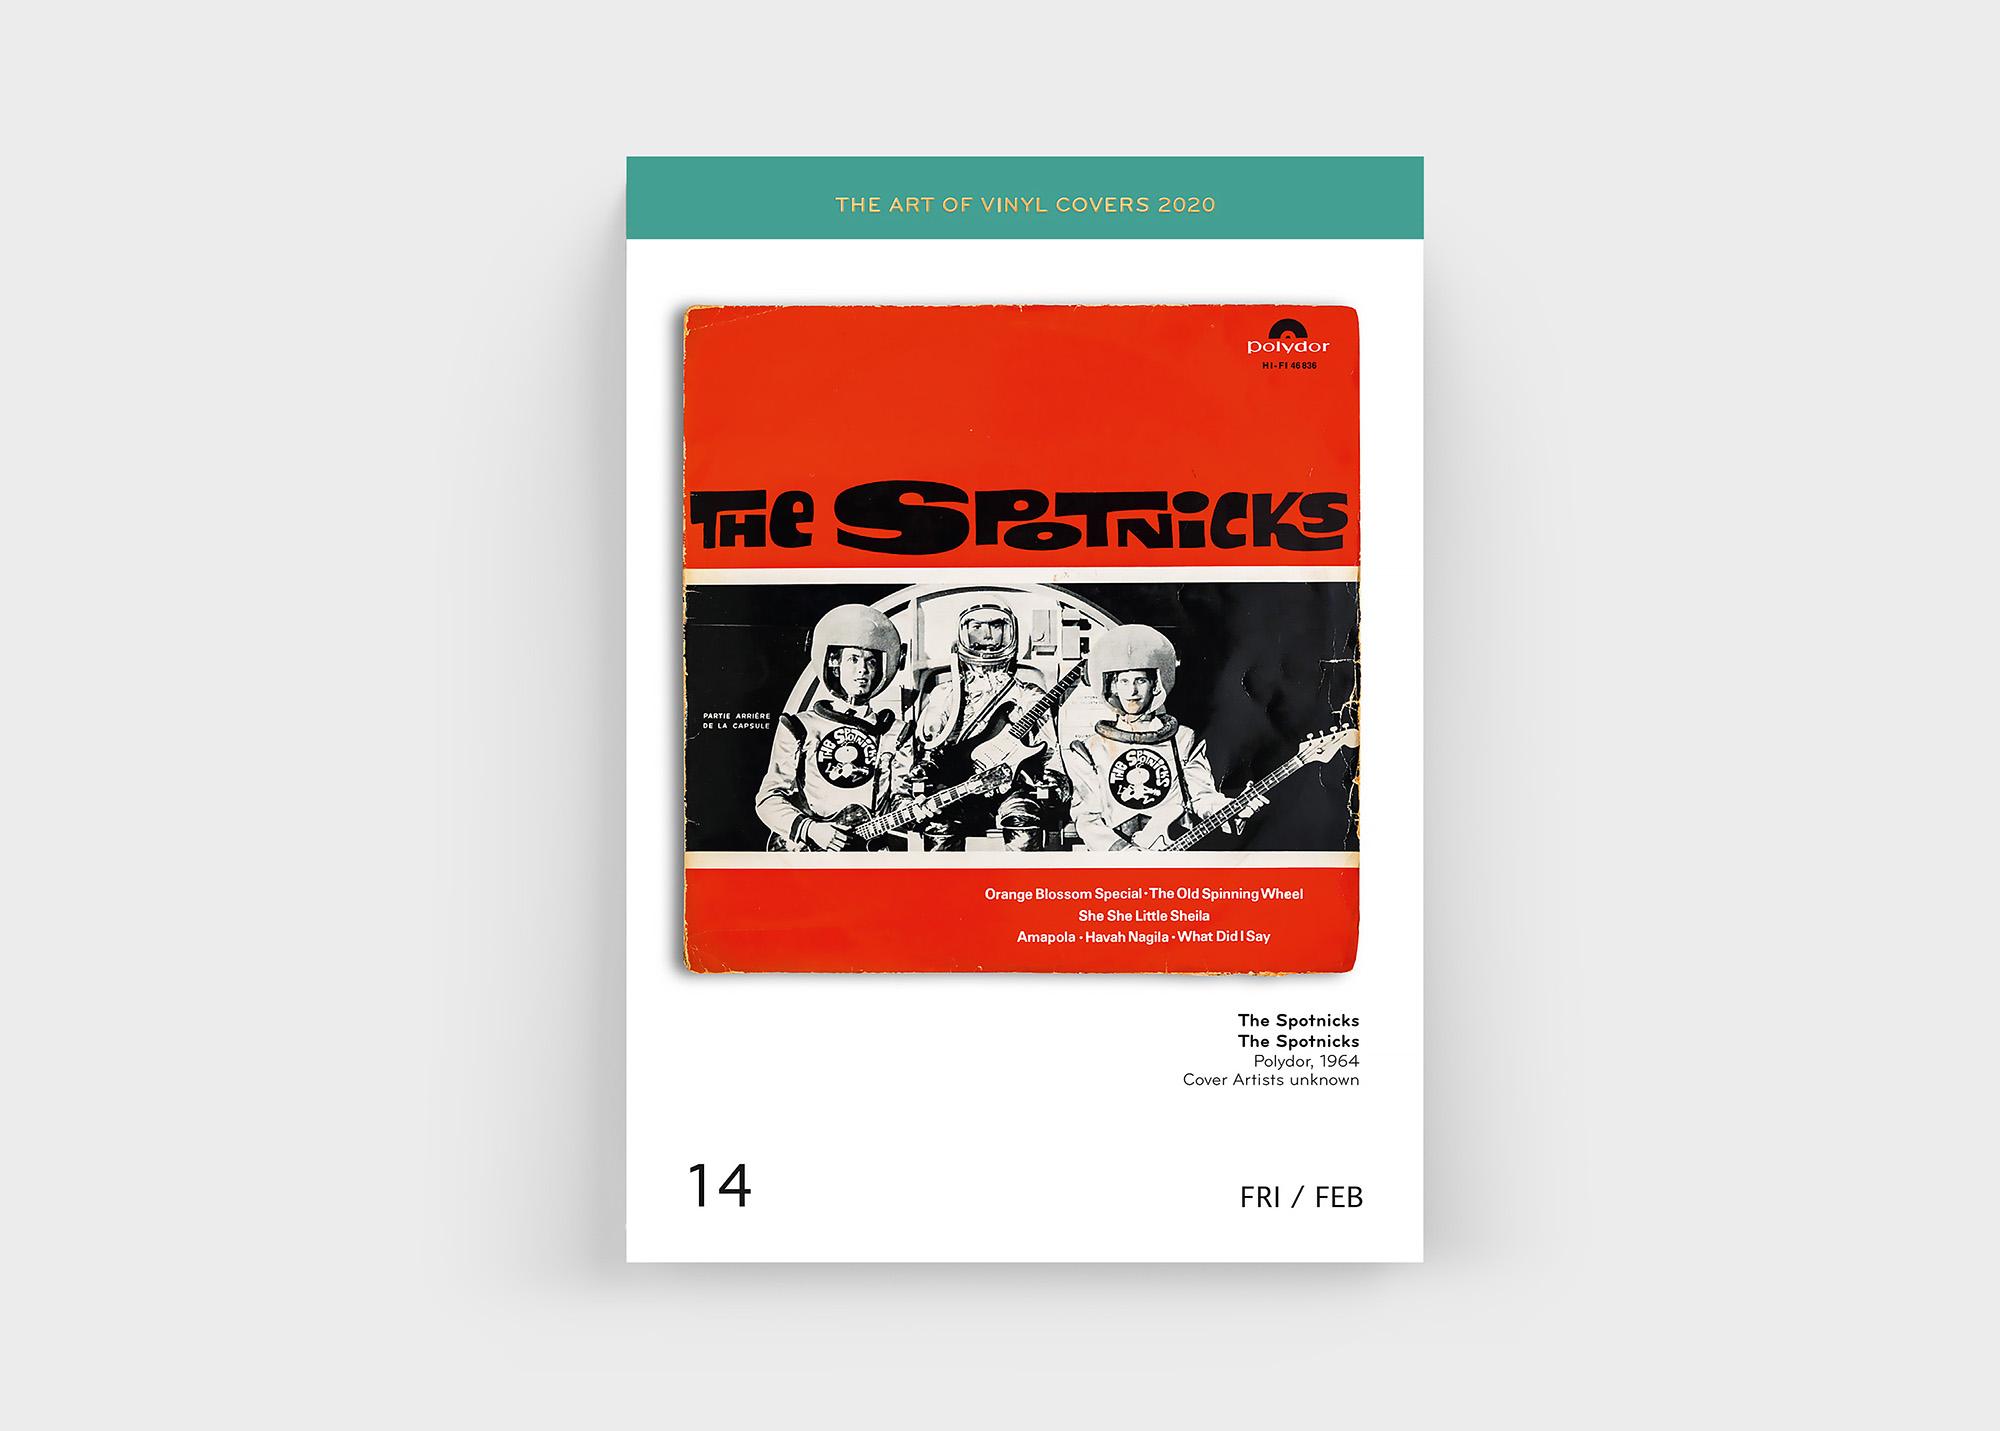 The Art Of Vinyl Covers 2020